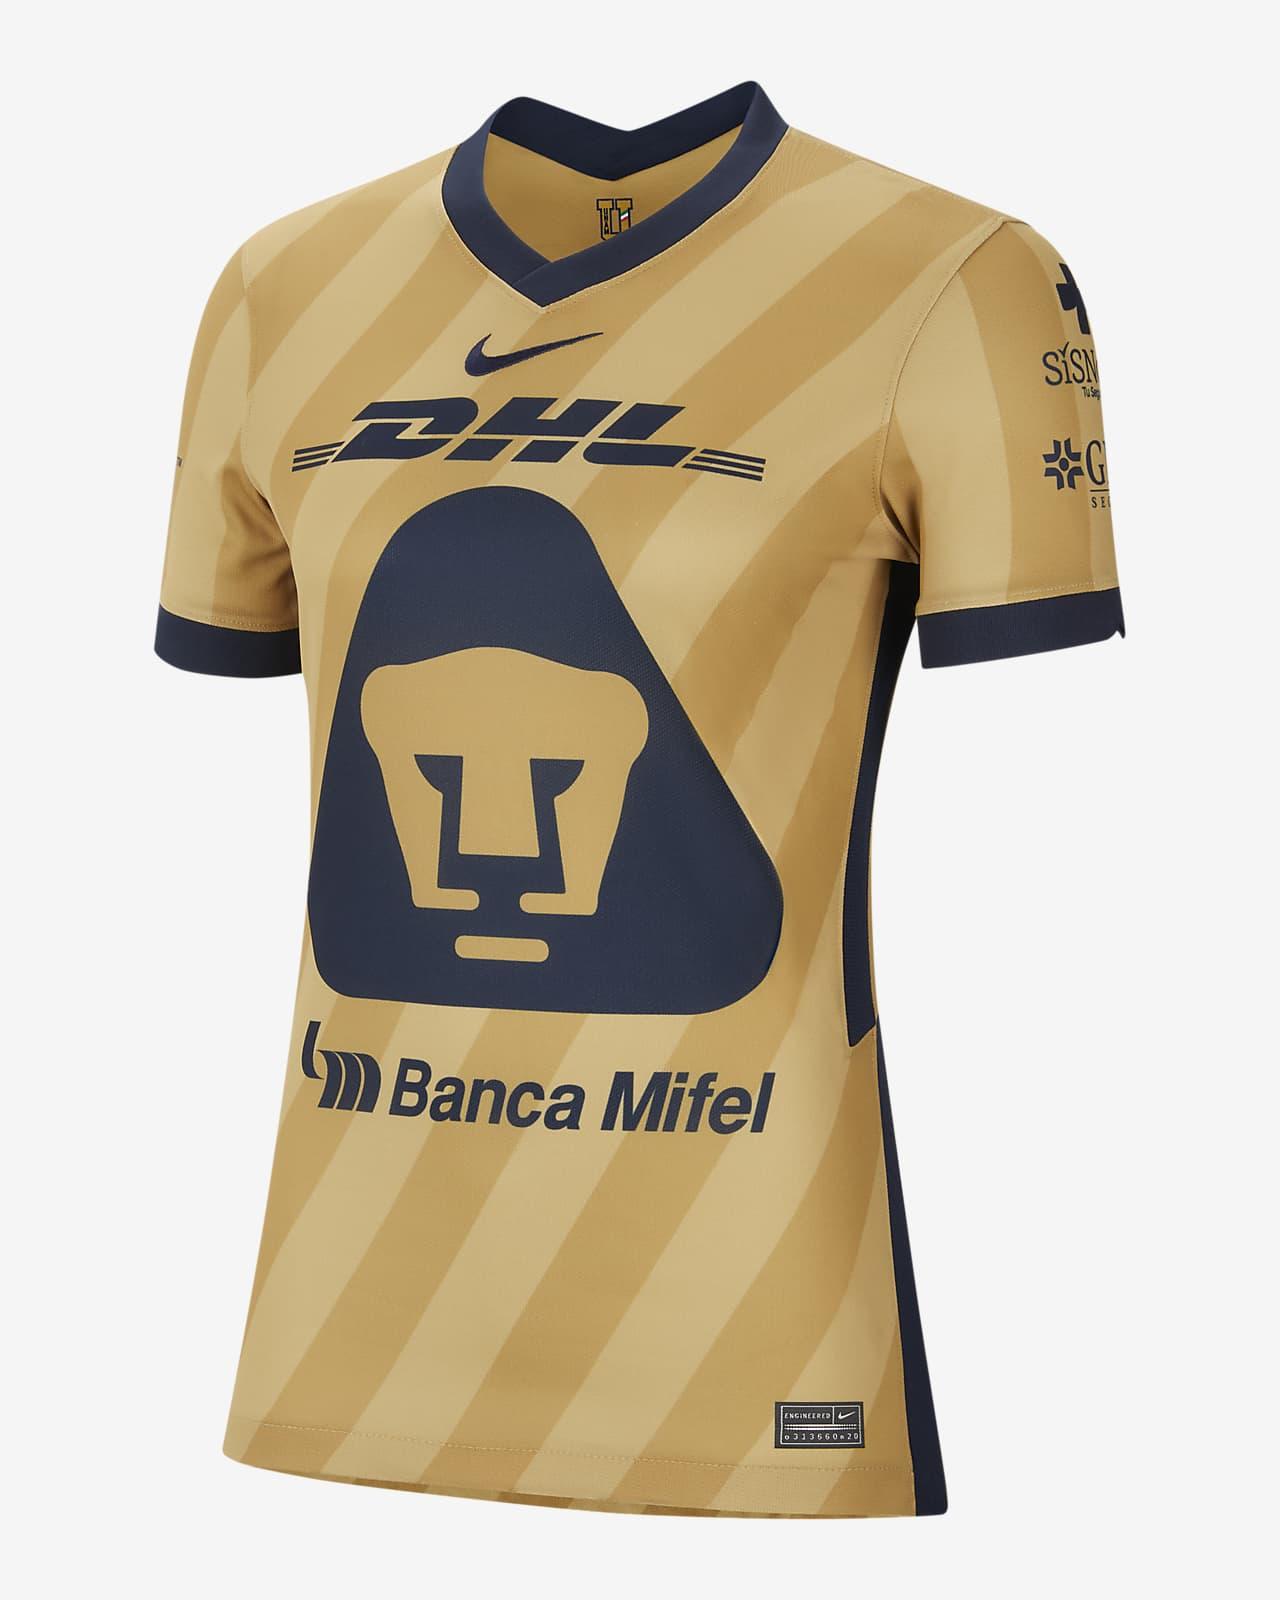 Pumas UNAM 2020/21 Stadium Third Women's Soccer Jersey. Nike.com